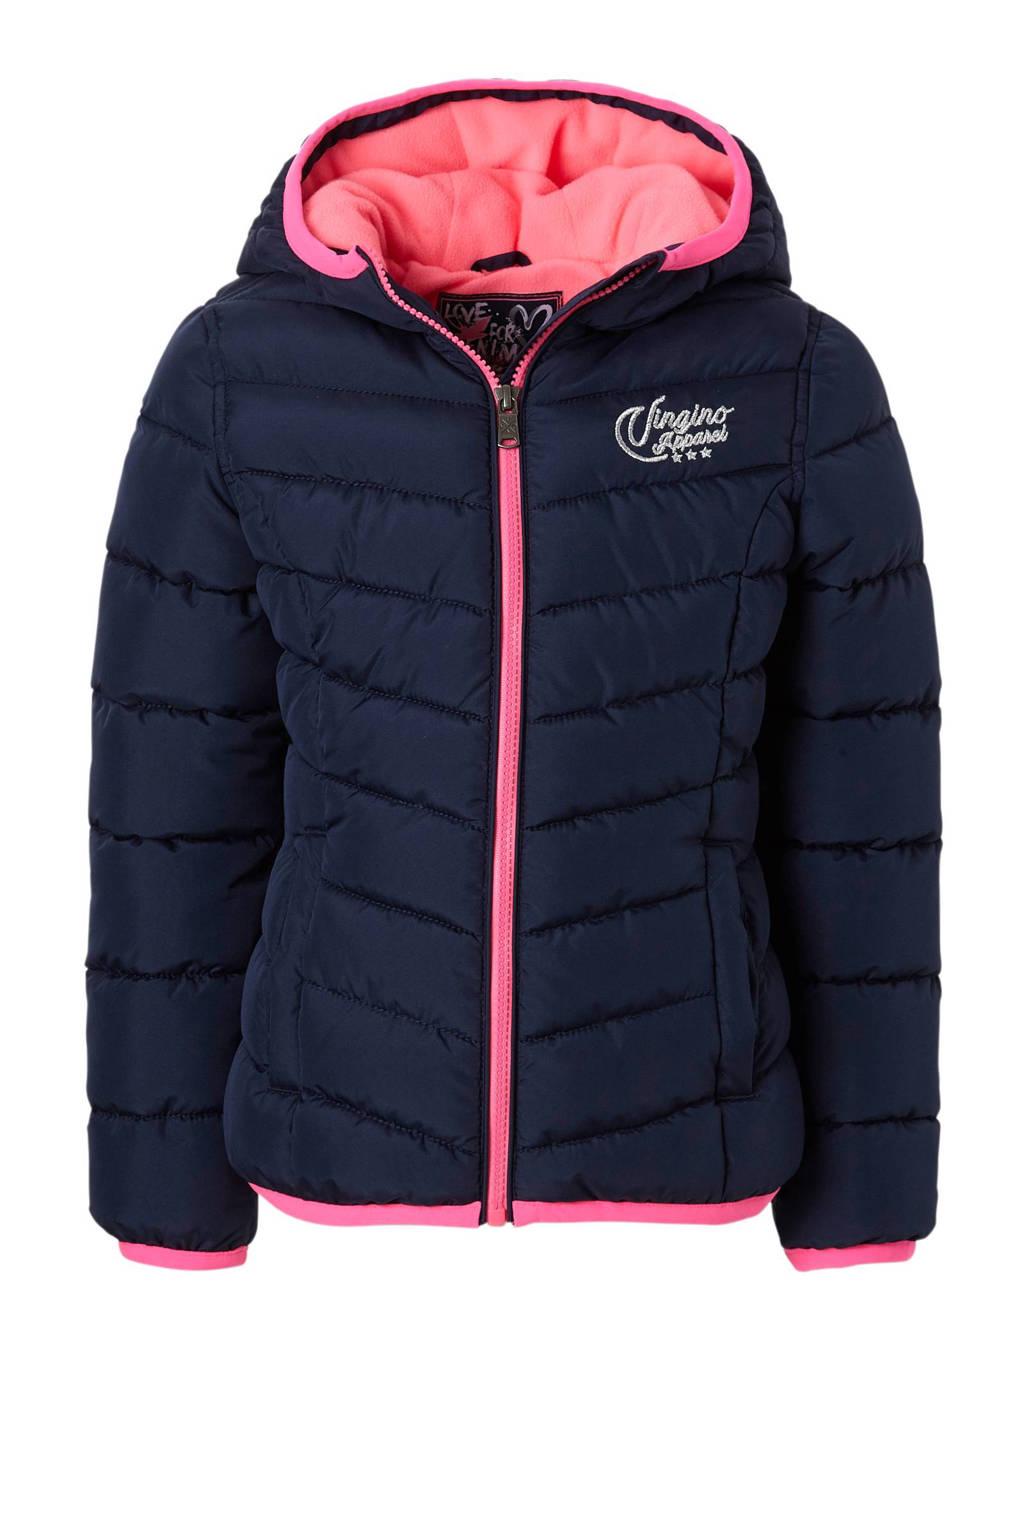 Vingino winterjas Tjessa donkerblauw, Donkerblauw/roze